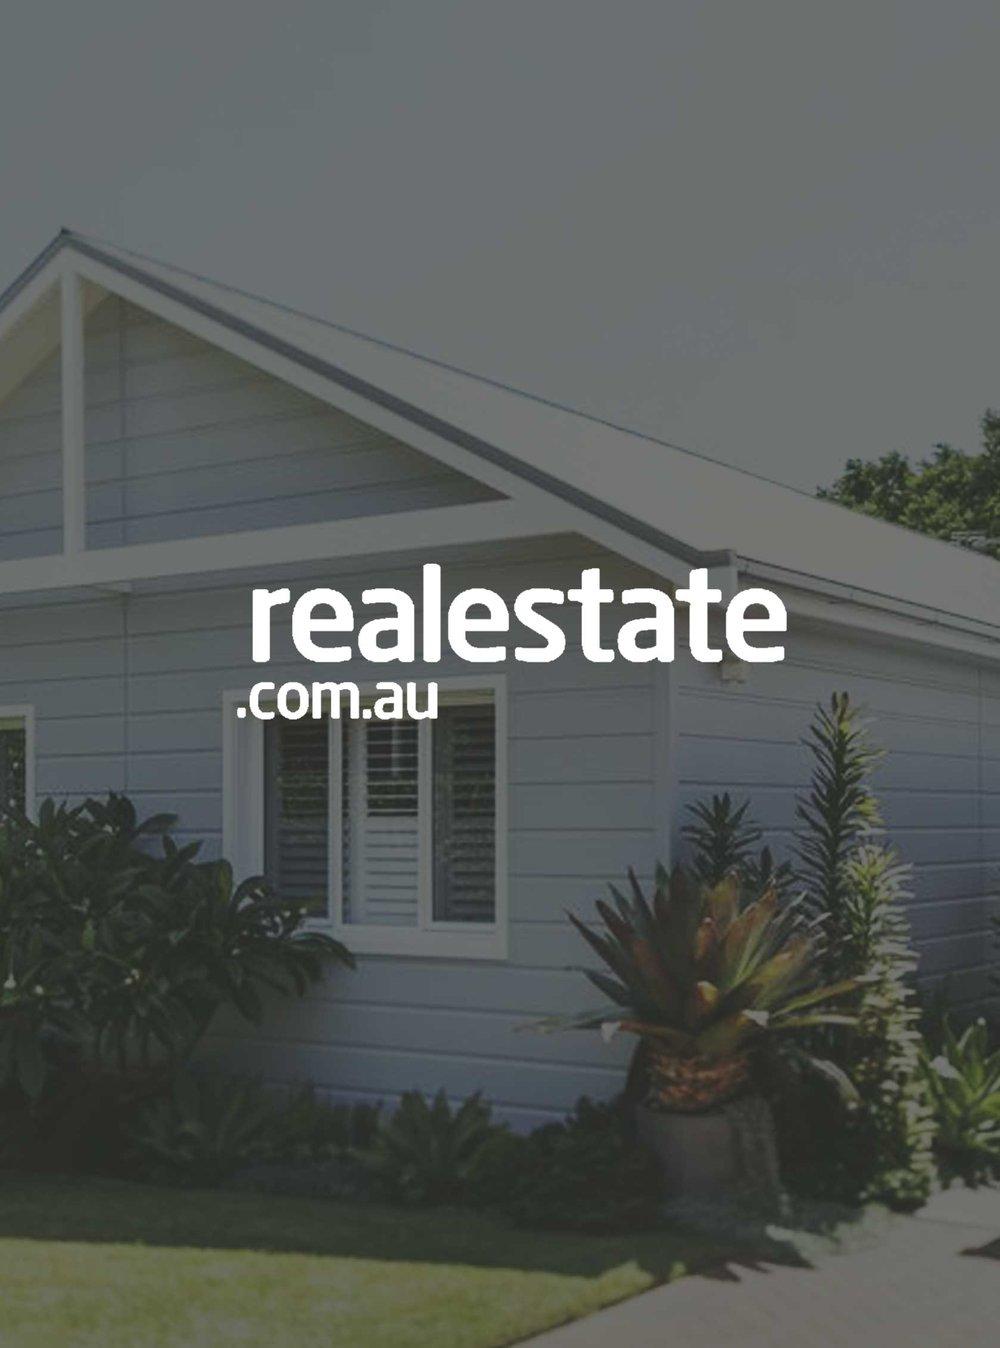 RealEstate.com.au - 'Create a Hamptons style garden'Jan 17, 2019